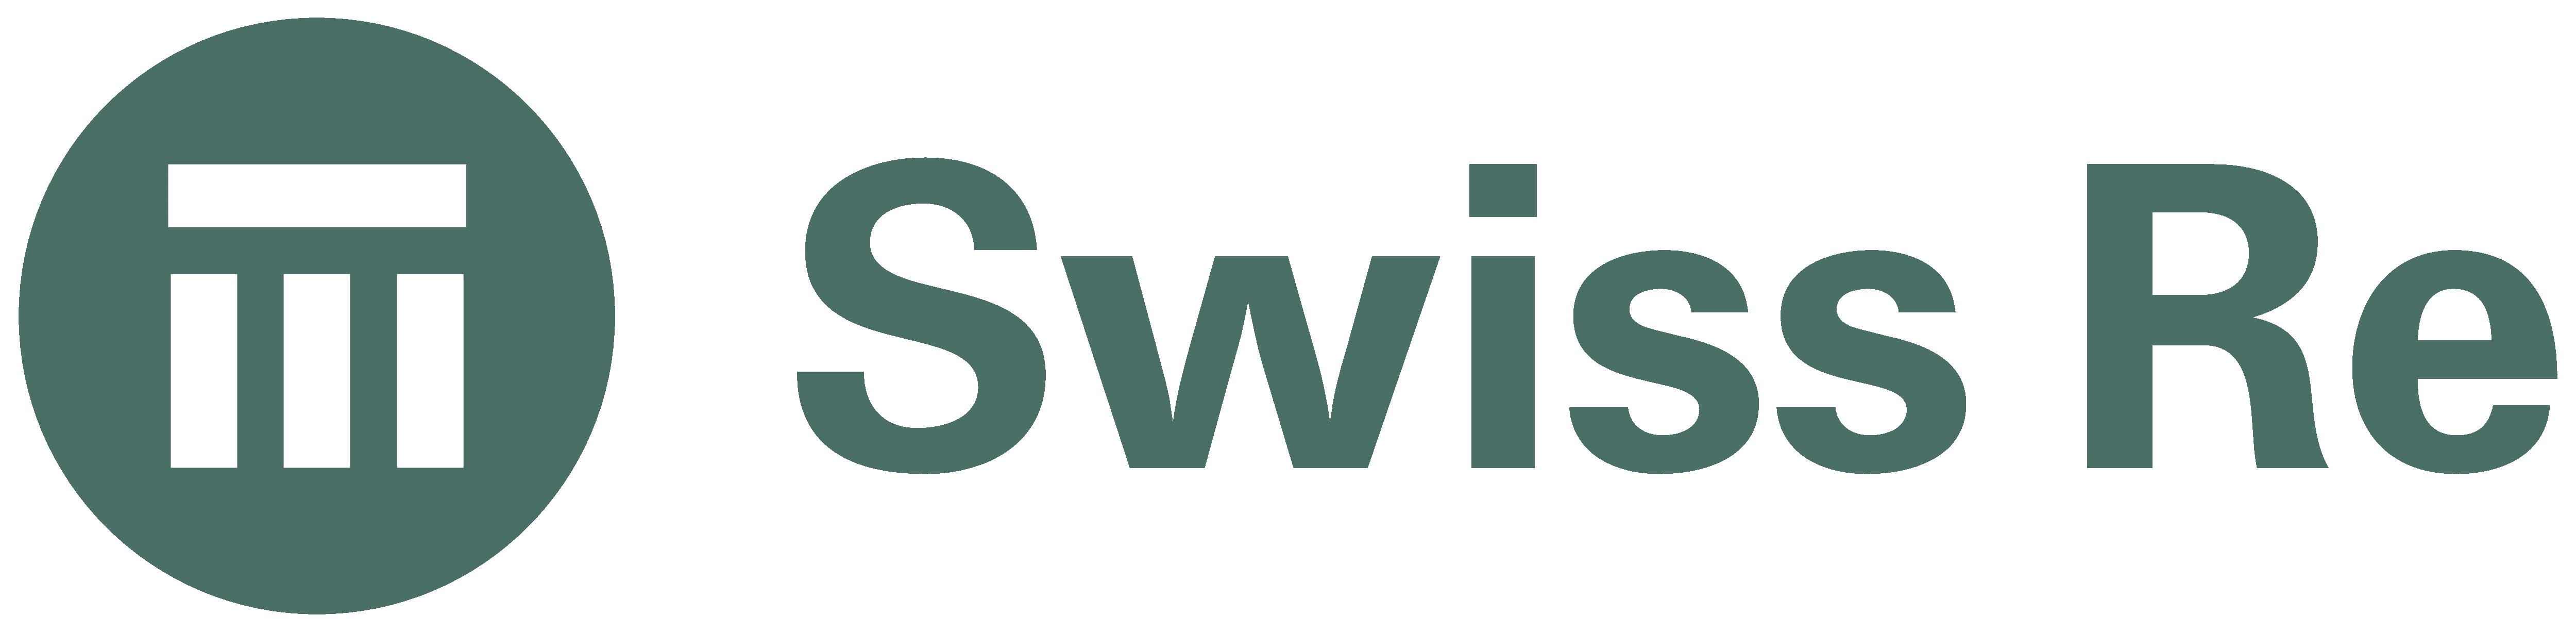 swiss re logos download hello kitty logo font download Hello Kitty and Celessence Logo Font